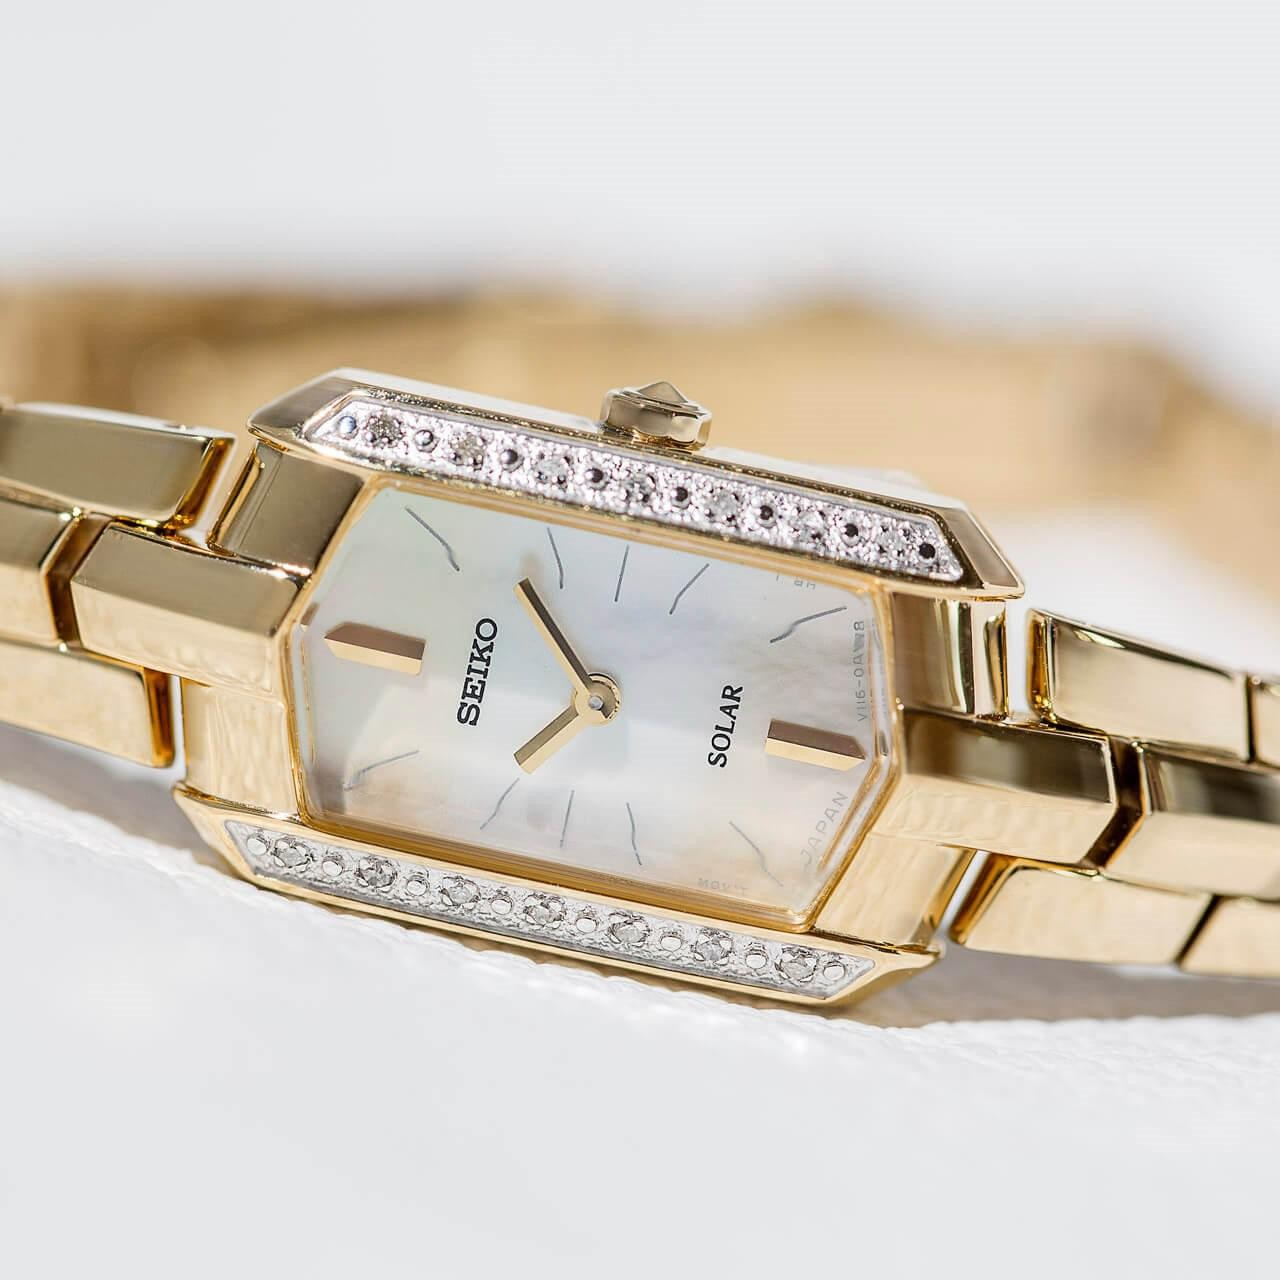 SEIKO 精工 Tressia SUP330 女士太阳能腕表